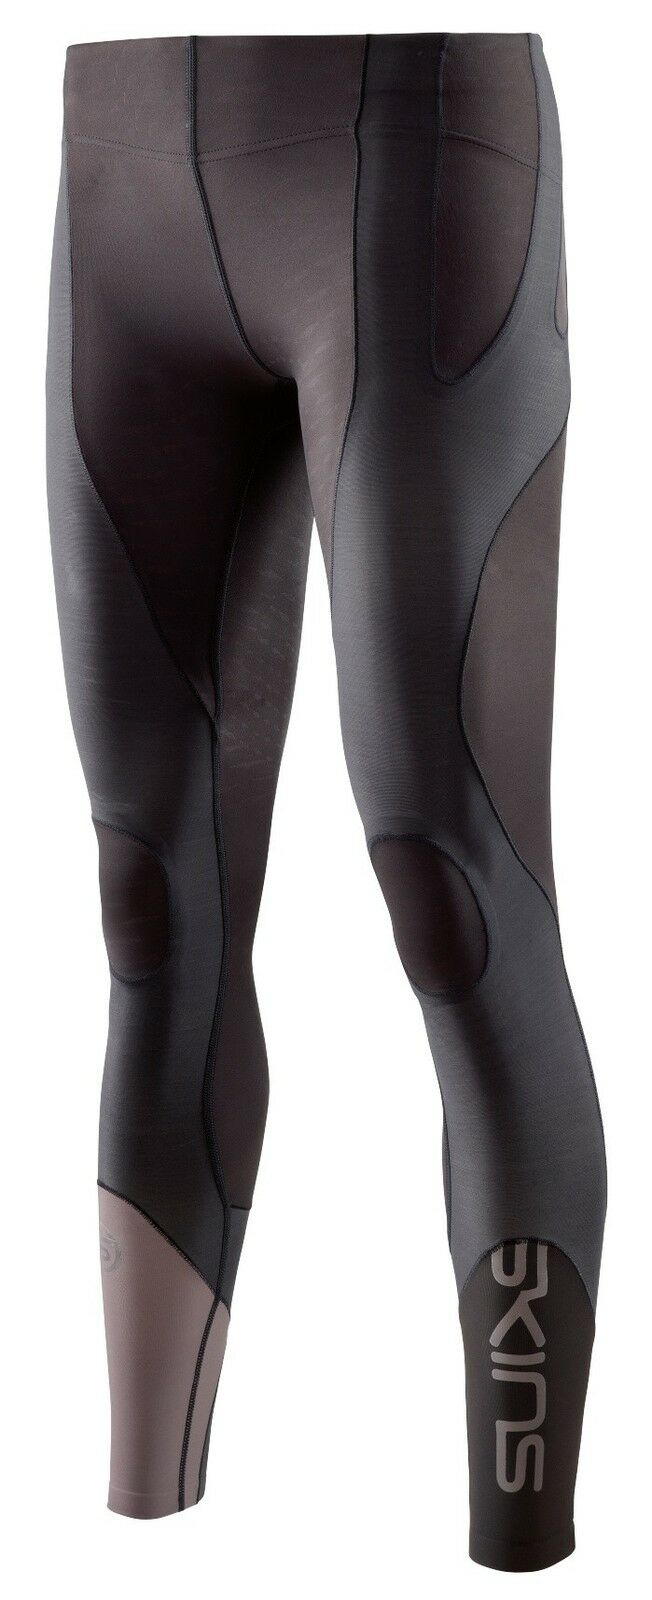 Skins K-Proprium Womens Long Tights Compression Leggings- Espresso